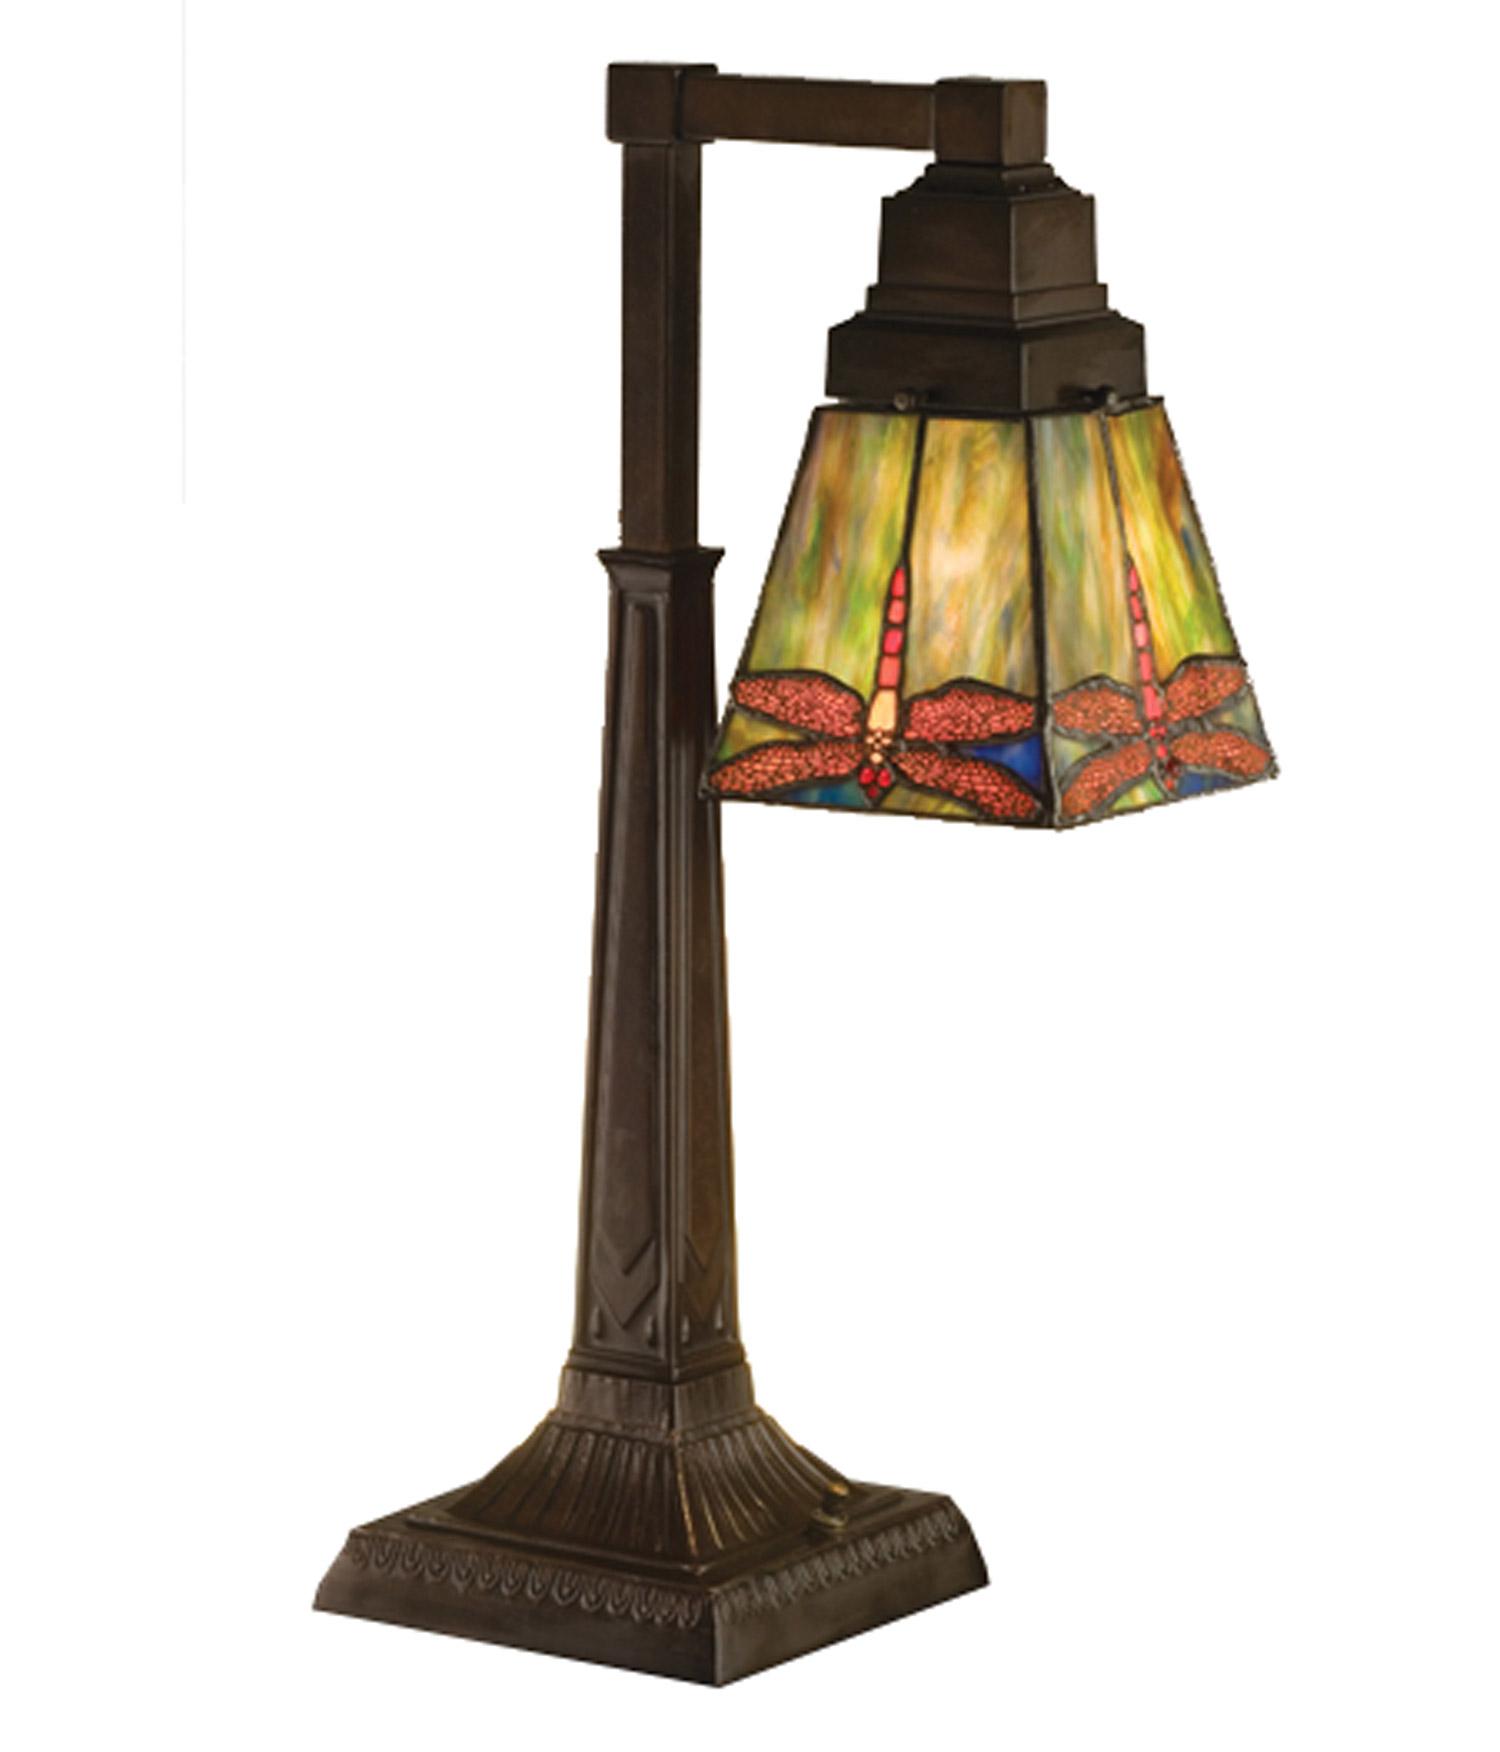 48212 Prairie Dragonfly Desk Lamp – Dragonfly Desk Lamp